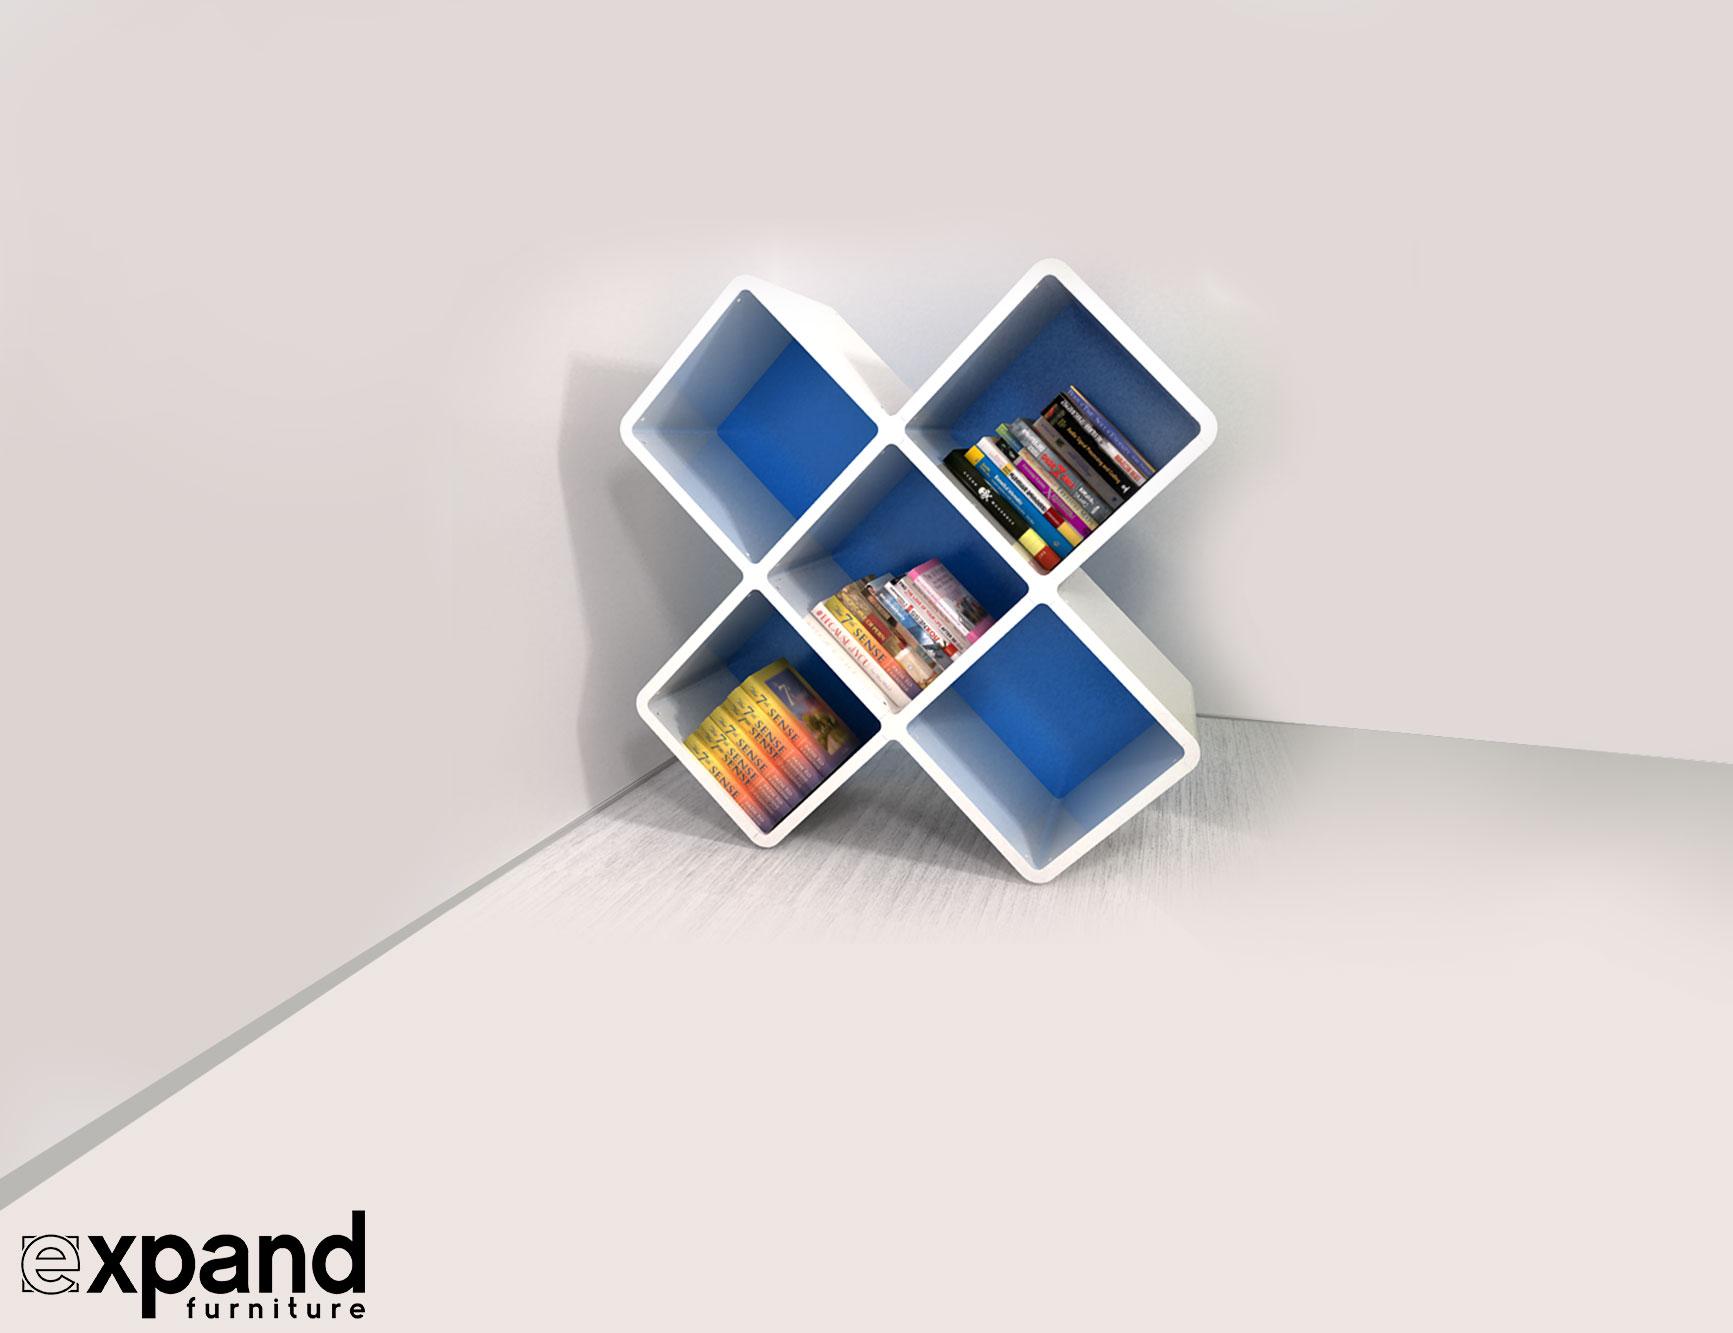 210 3x3cb X Shaped Bookshelf Unique Storage In